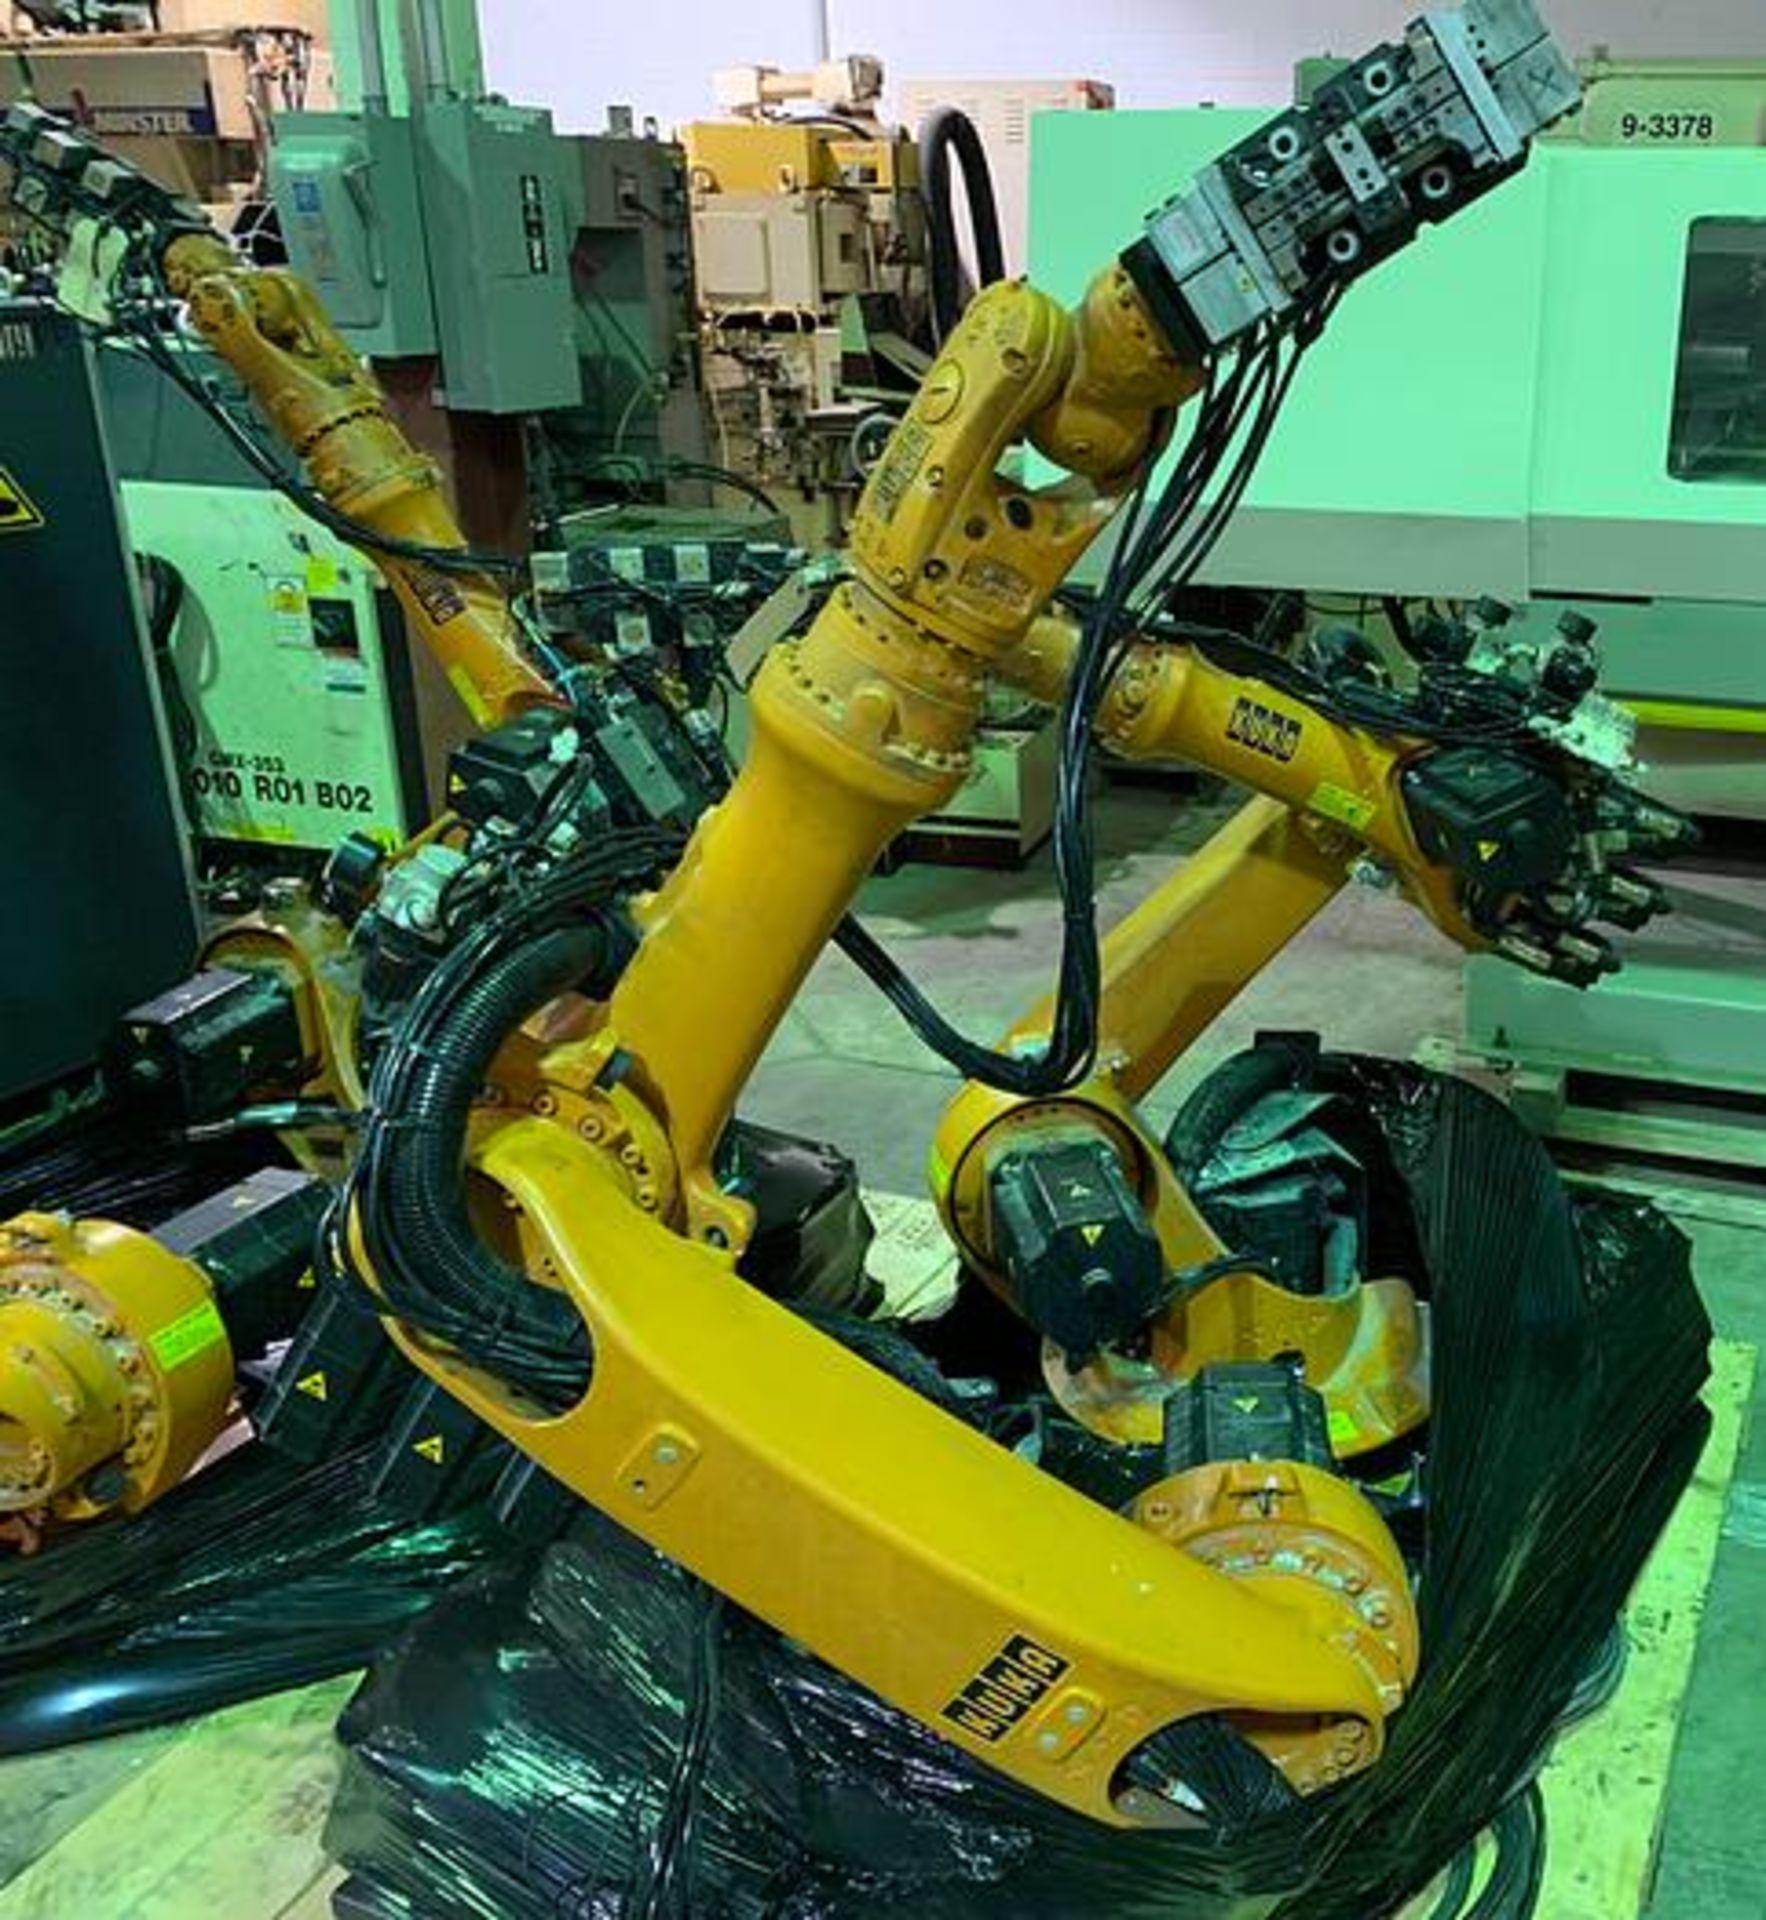 Lot 64 - KUKA KR6 ARC 6 AXIS CNC ROBOT 6KG X 1611MM W/KRC2 ed05 CONTROL, YEAR 2006, SN 880294/45502